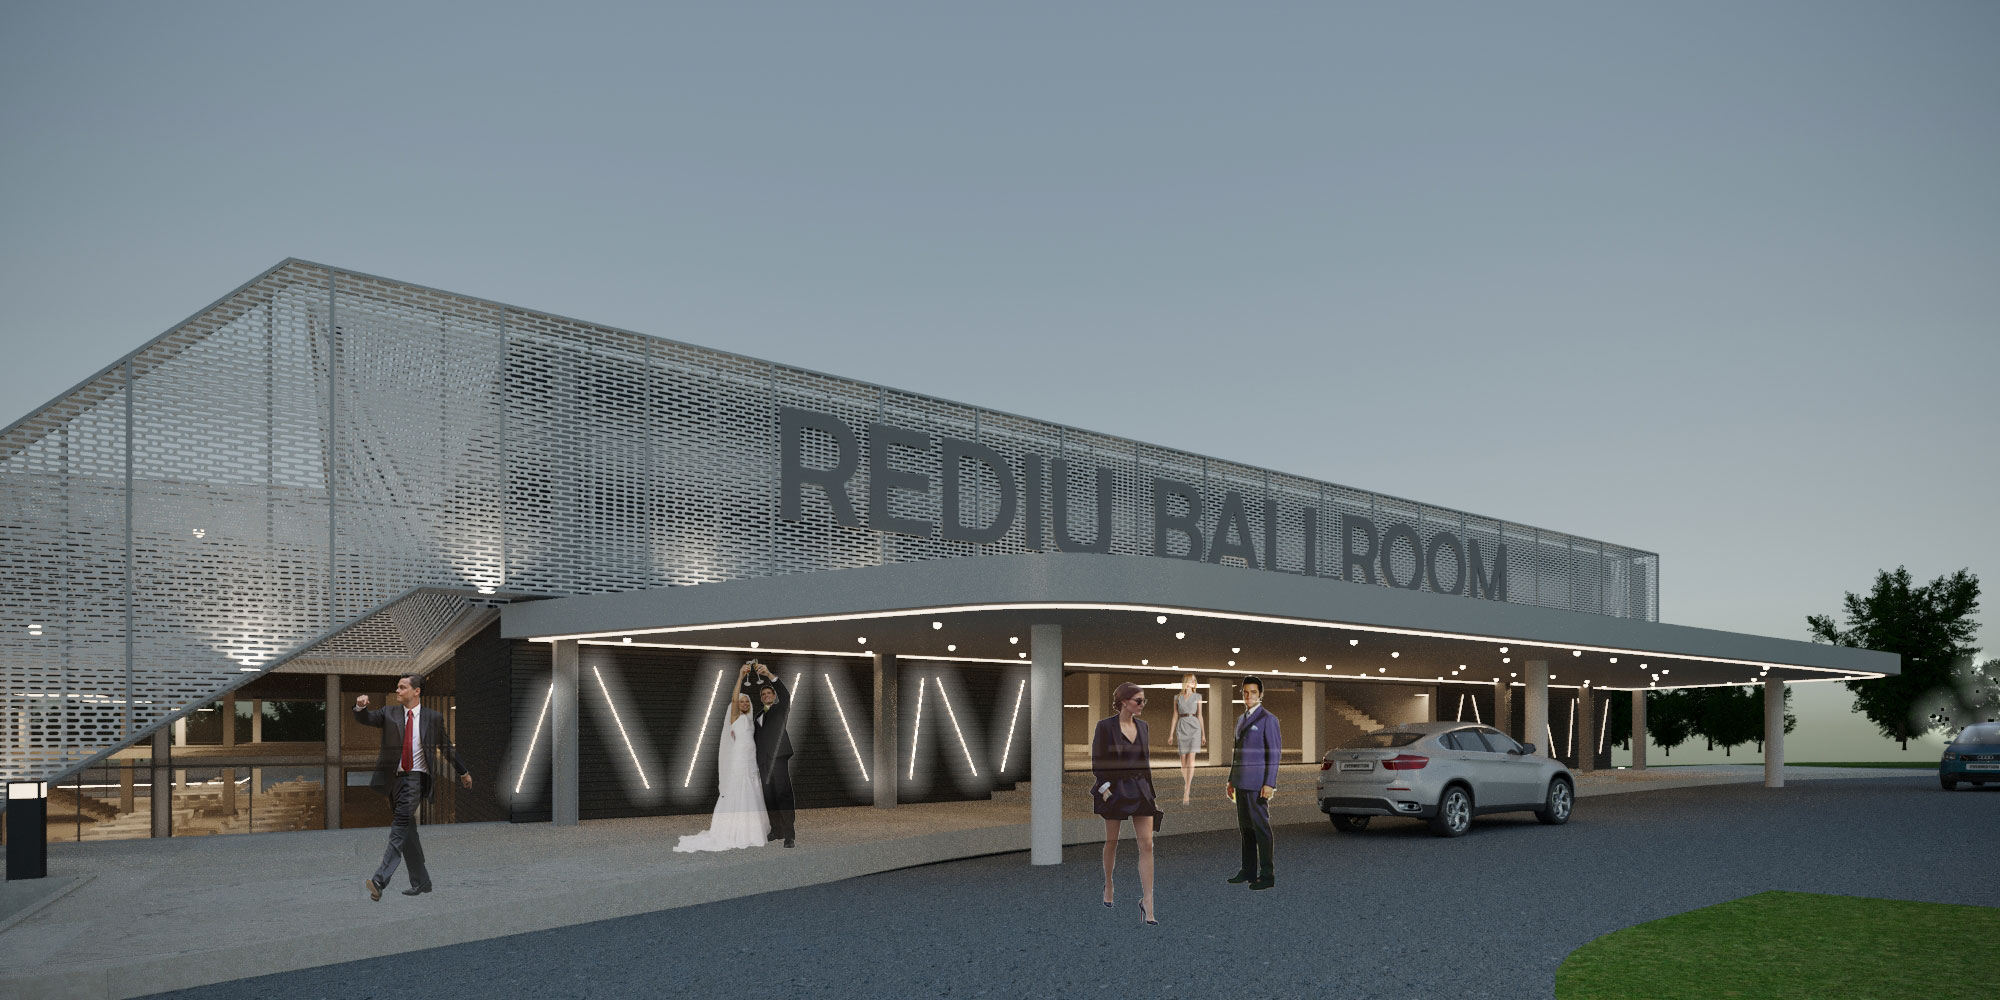 https://nbc-arhitect.ro/wp-content/uploads/2020/11/NBC-Arhitect-_-public-buildings-_-Botosani-Events-Center-_-Botosani-Romania_2.jpg